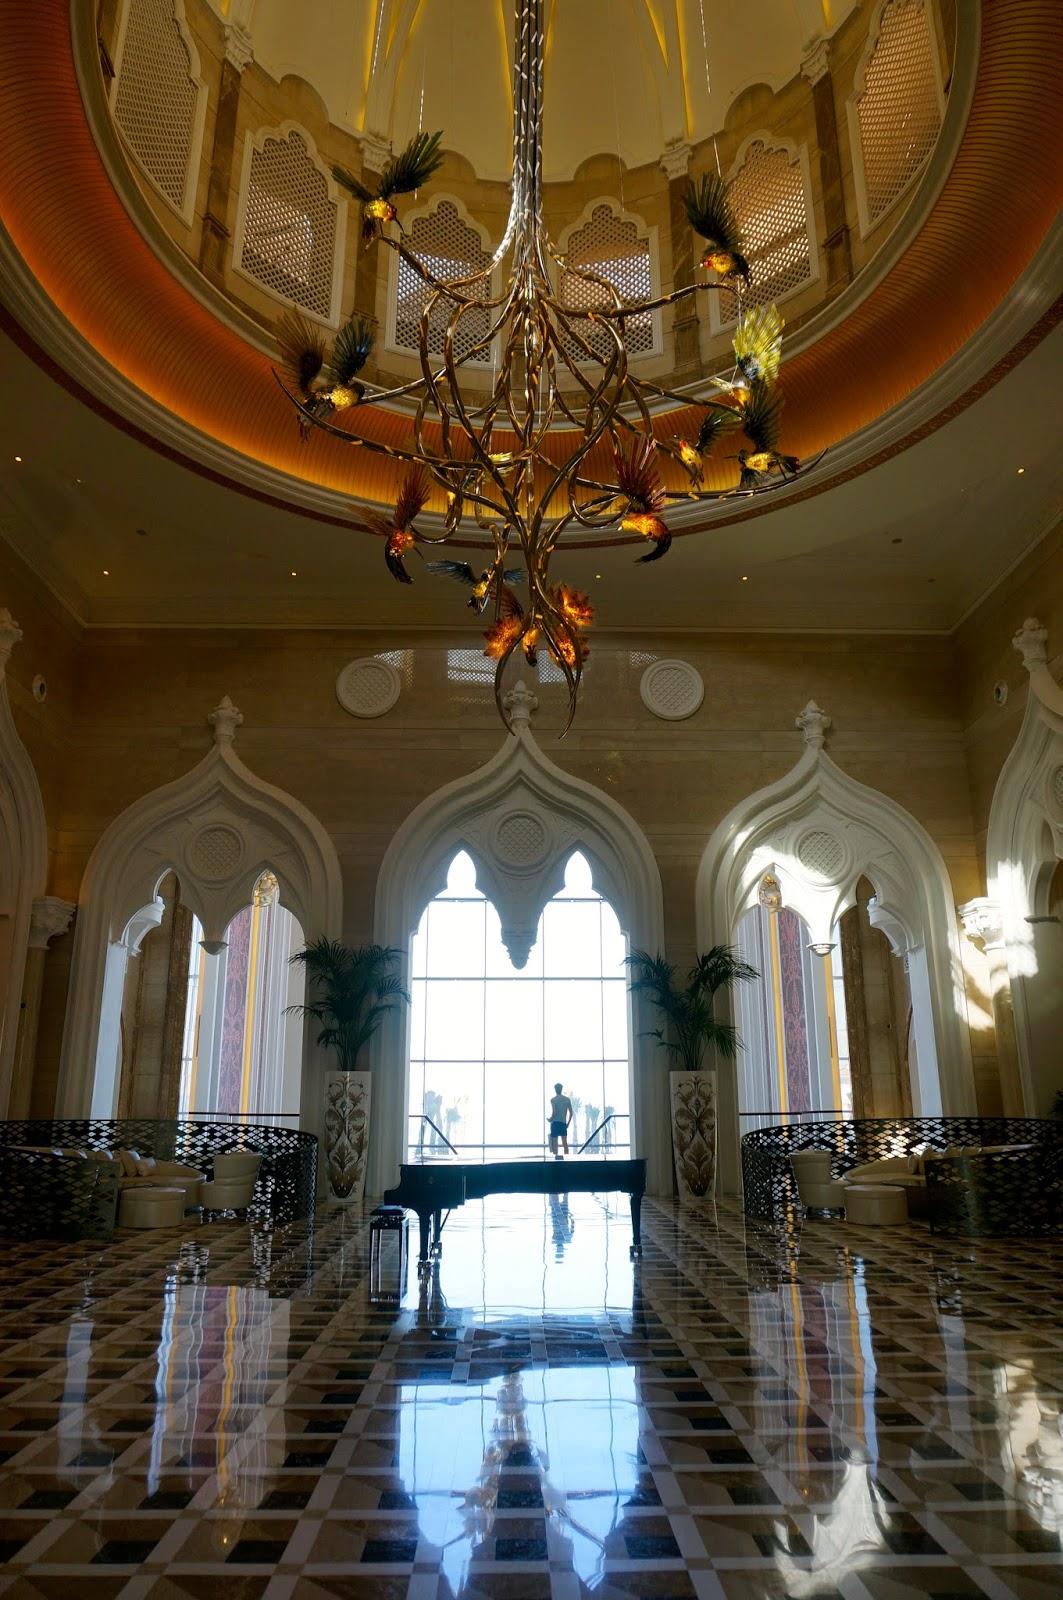 Pre-Opening Review: The Marsa Malaz, Doha